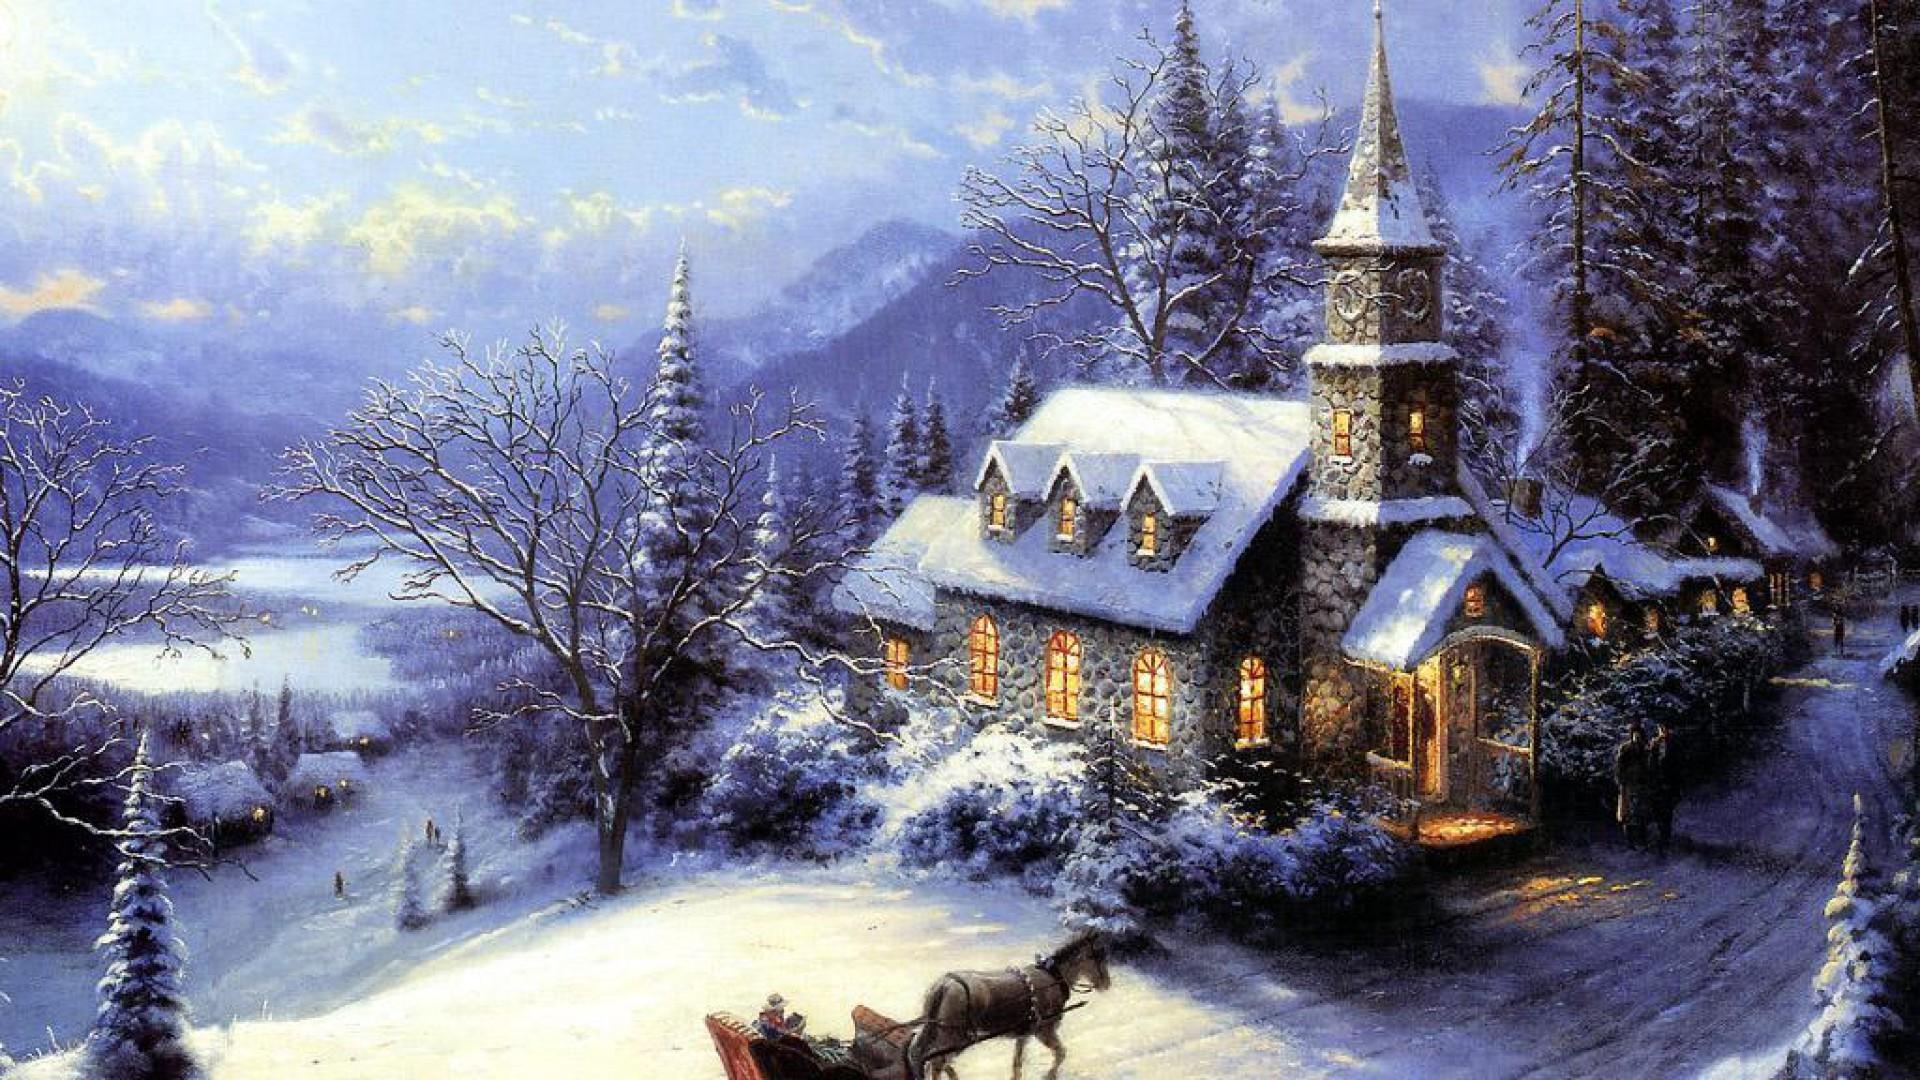 Christmas Winter 1080p Hd Wallpaper